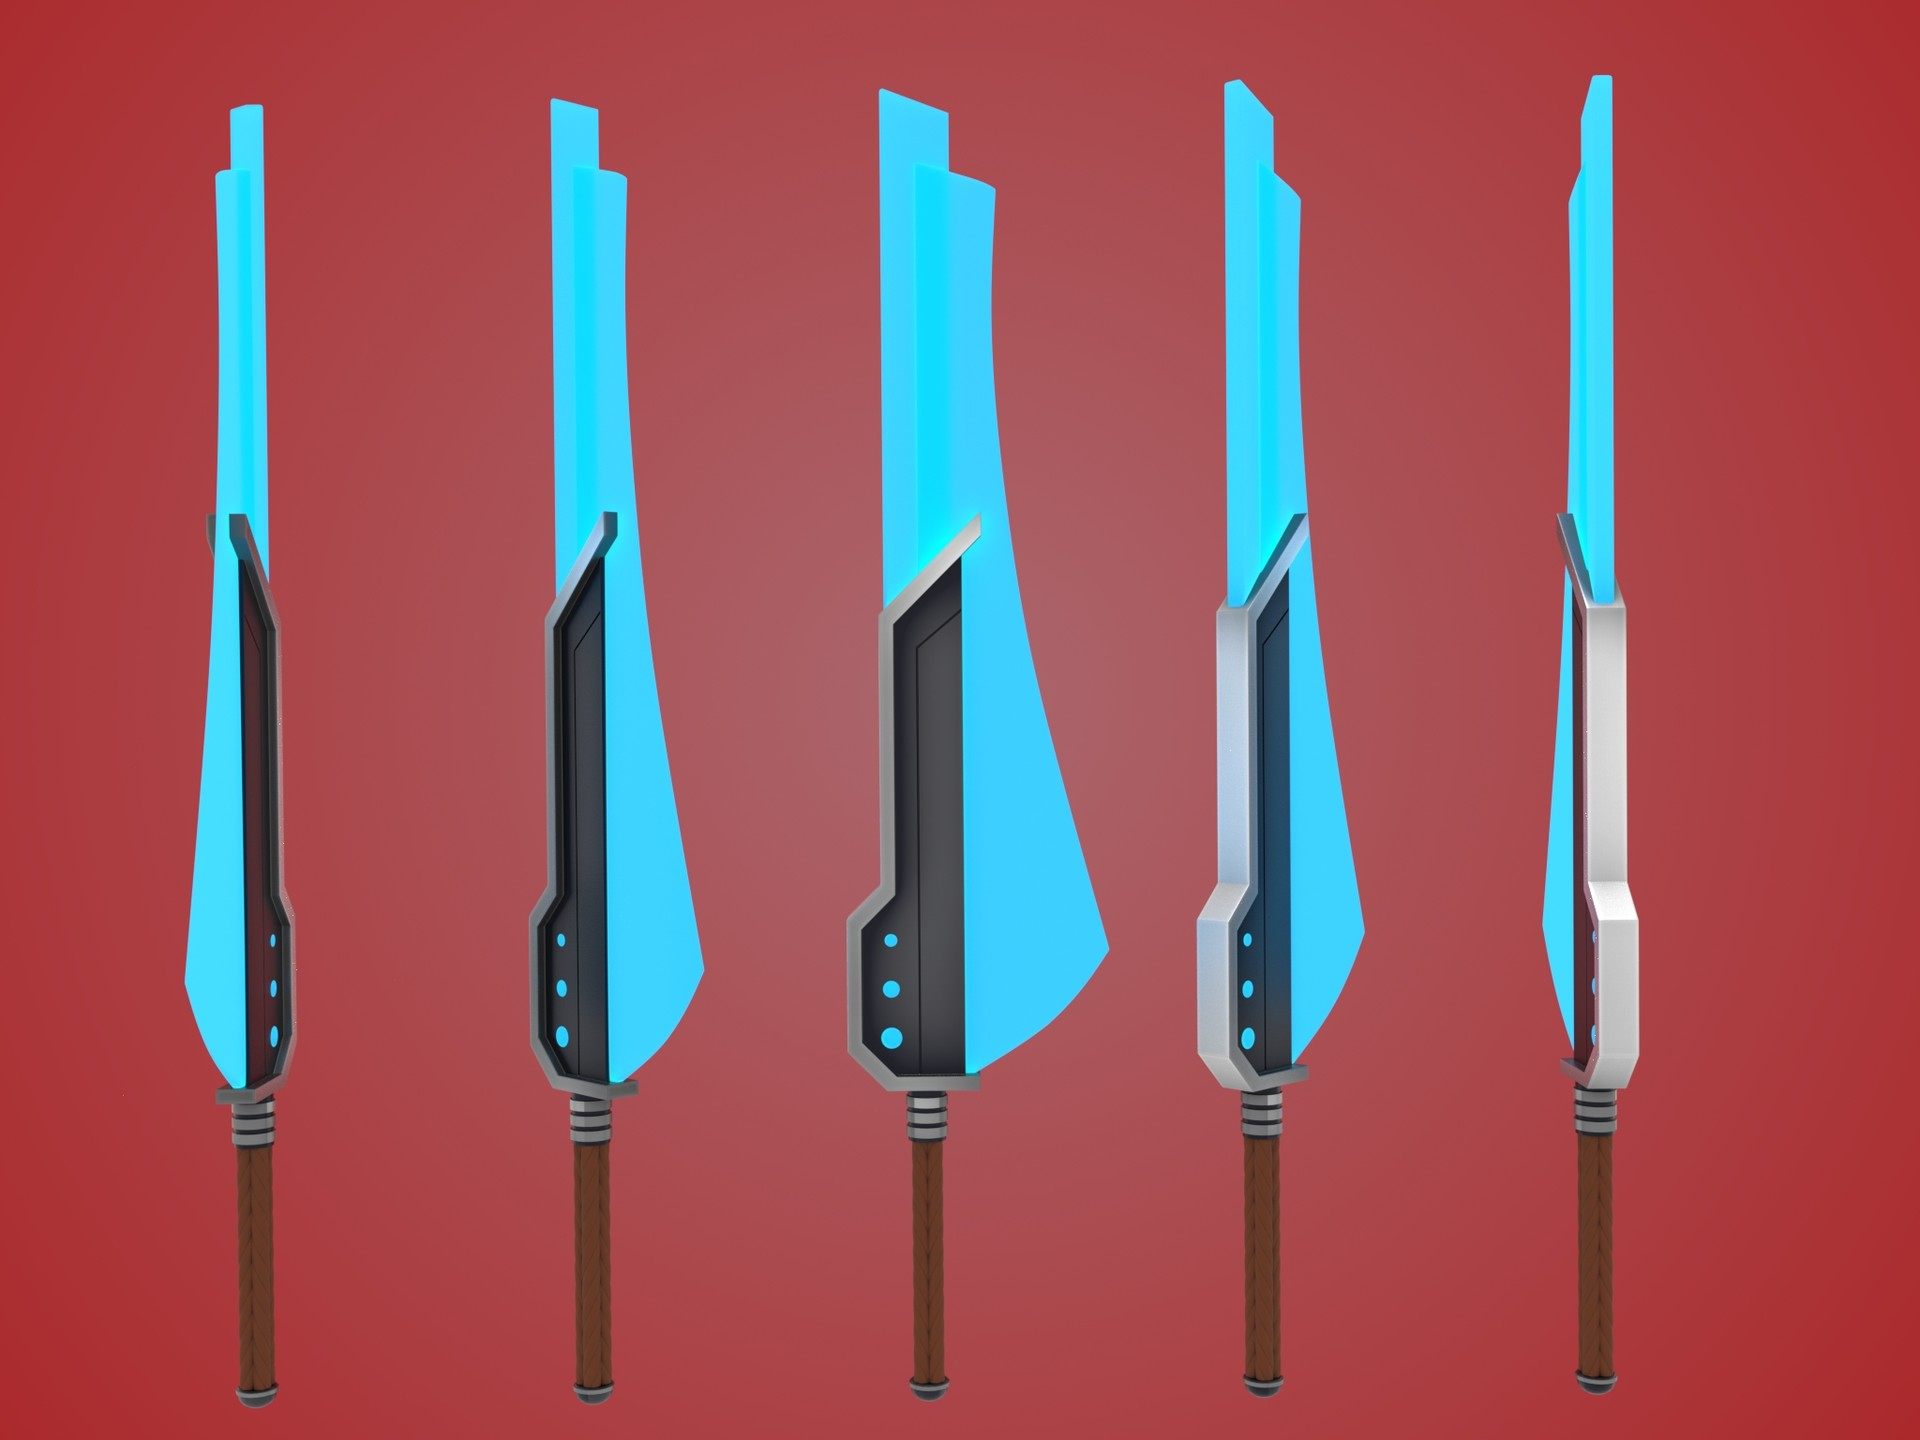 ArtStation - Stylized Futuristic Longsword, Jacques Fourie